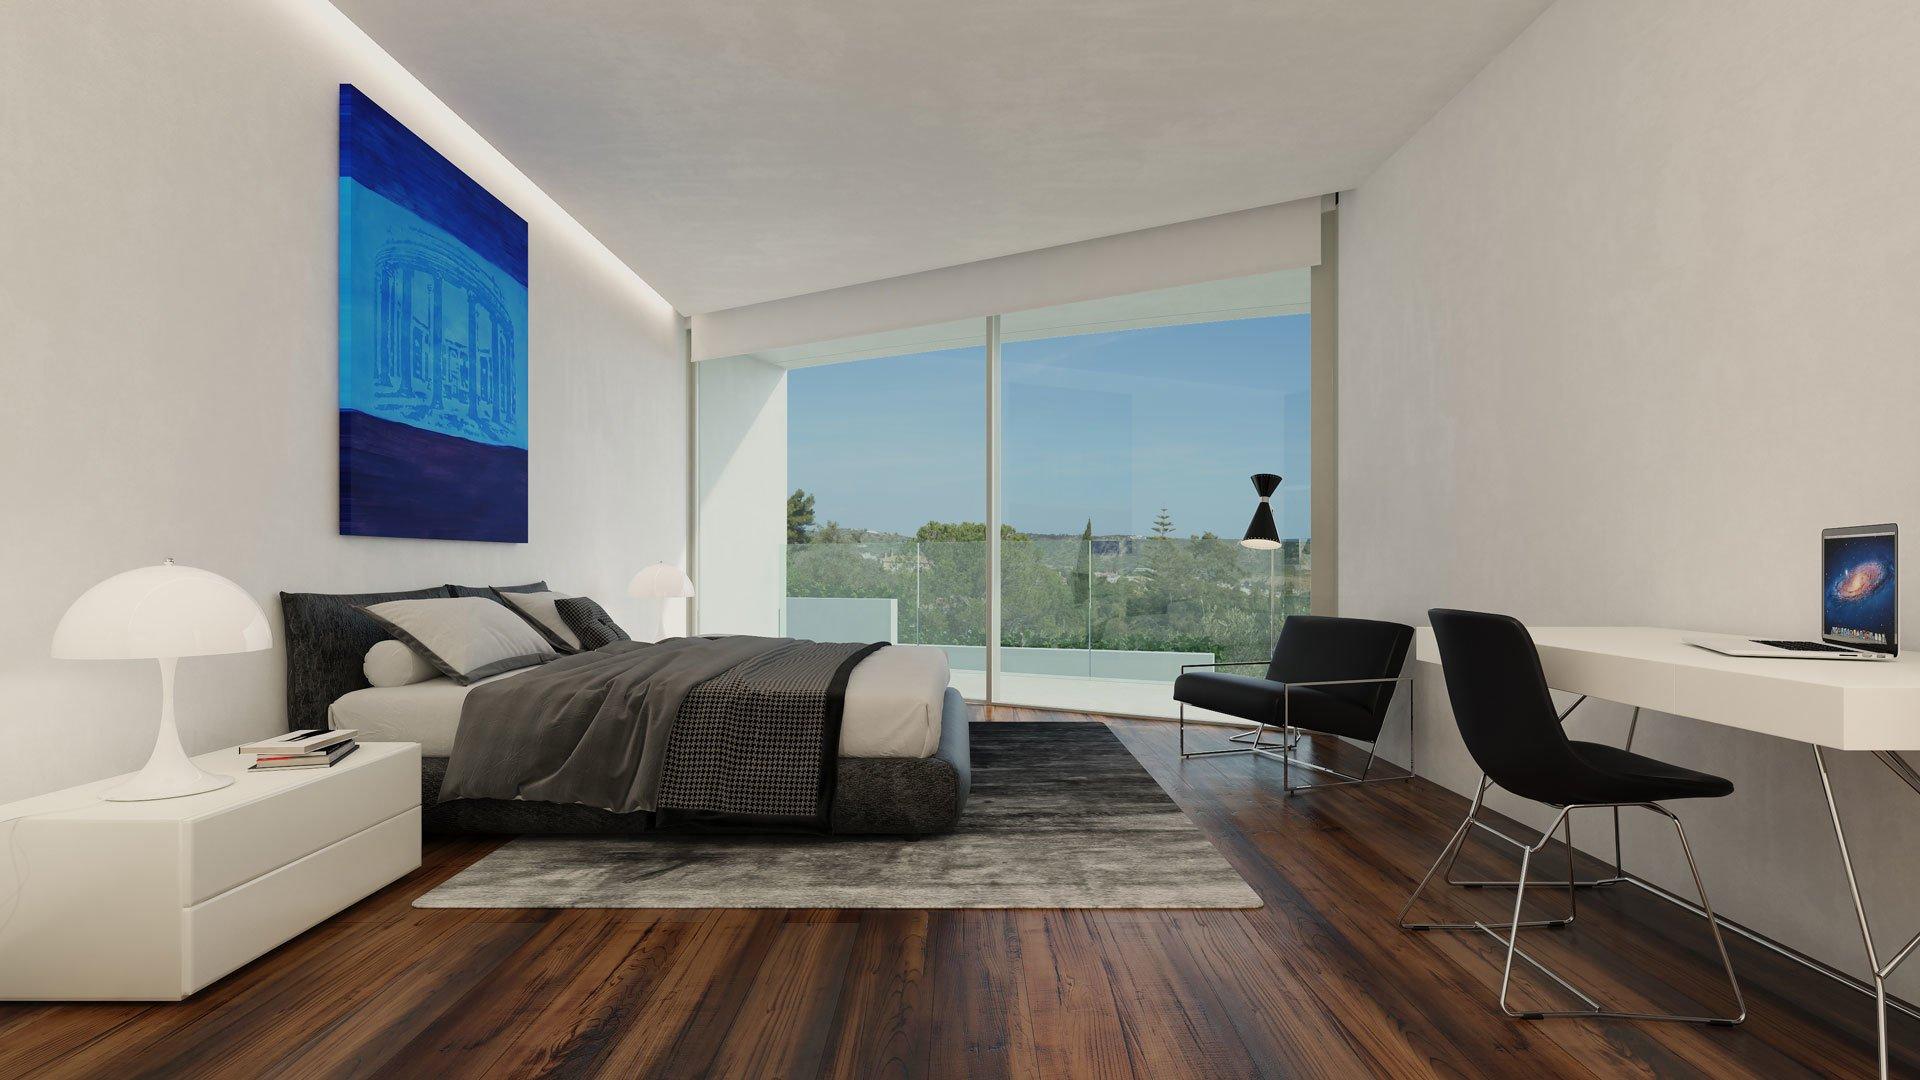 4 Bedroom Villa Praia da Luz, Western Algarve Ref: GV590